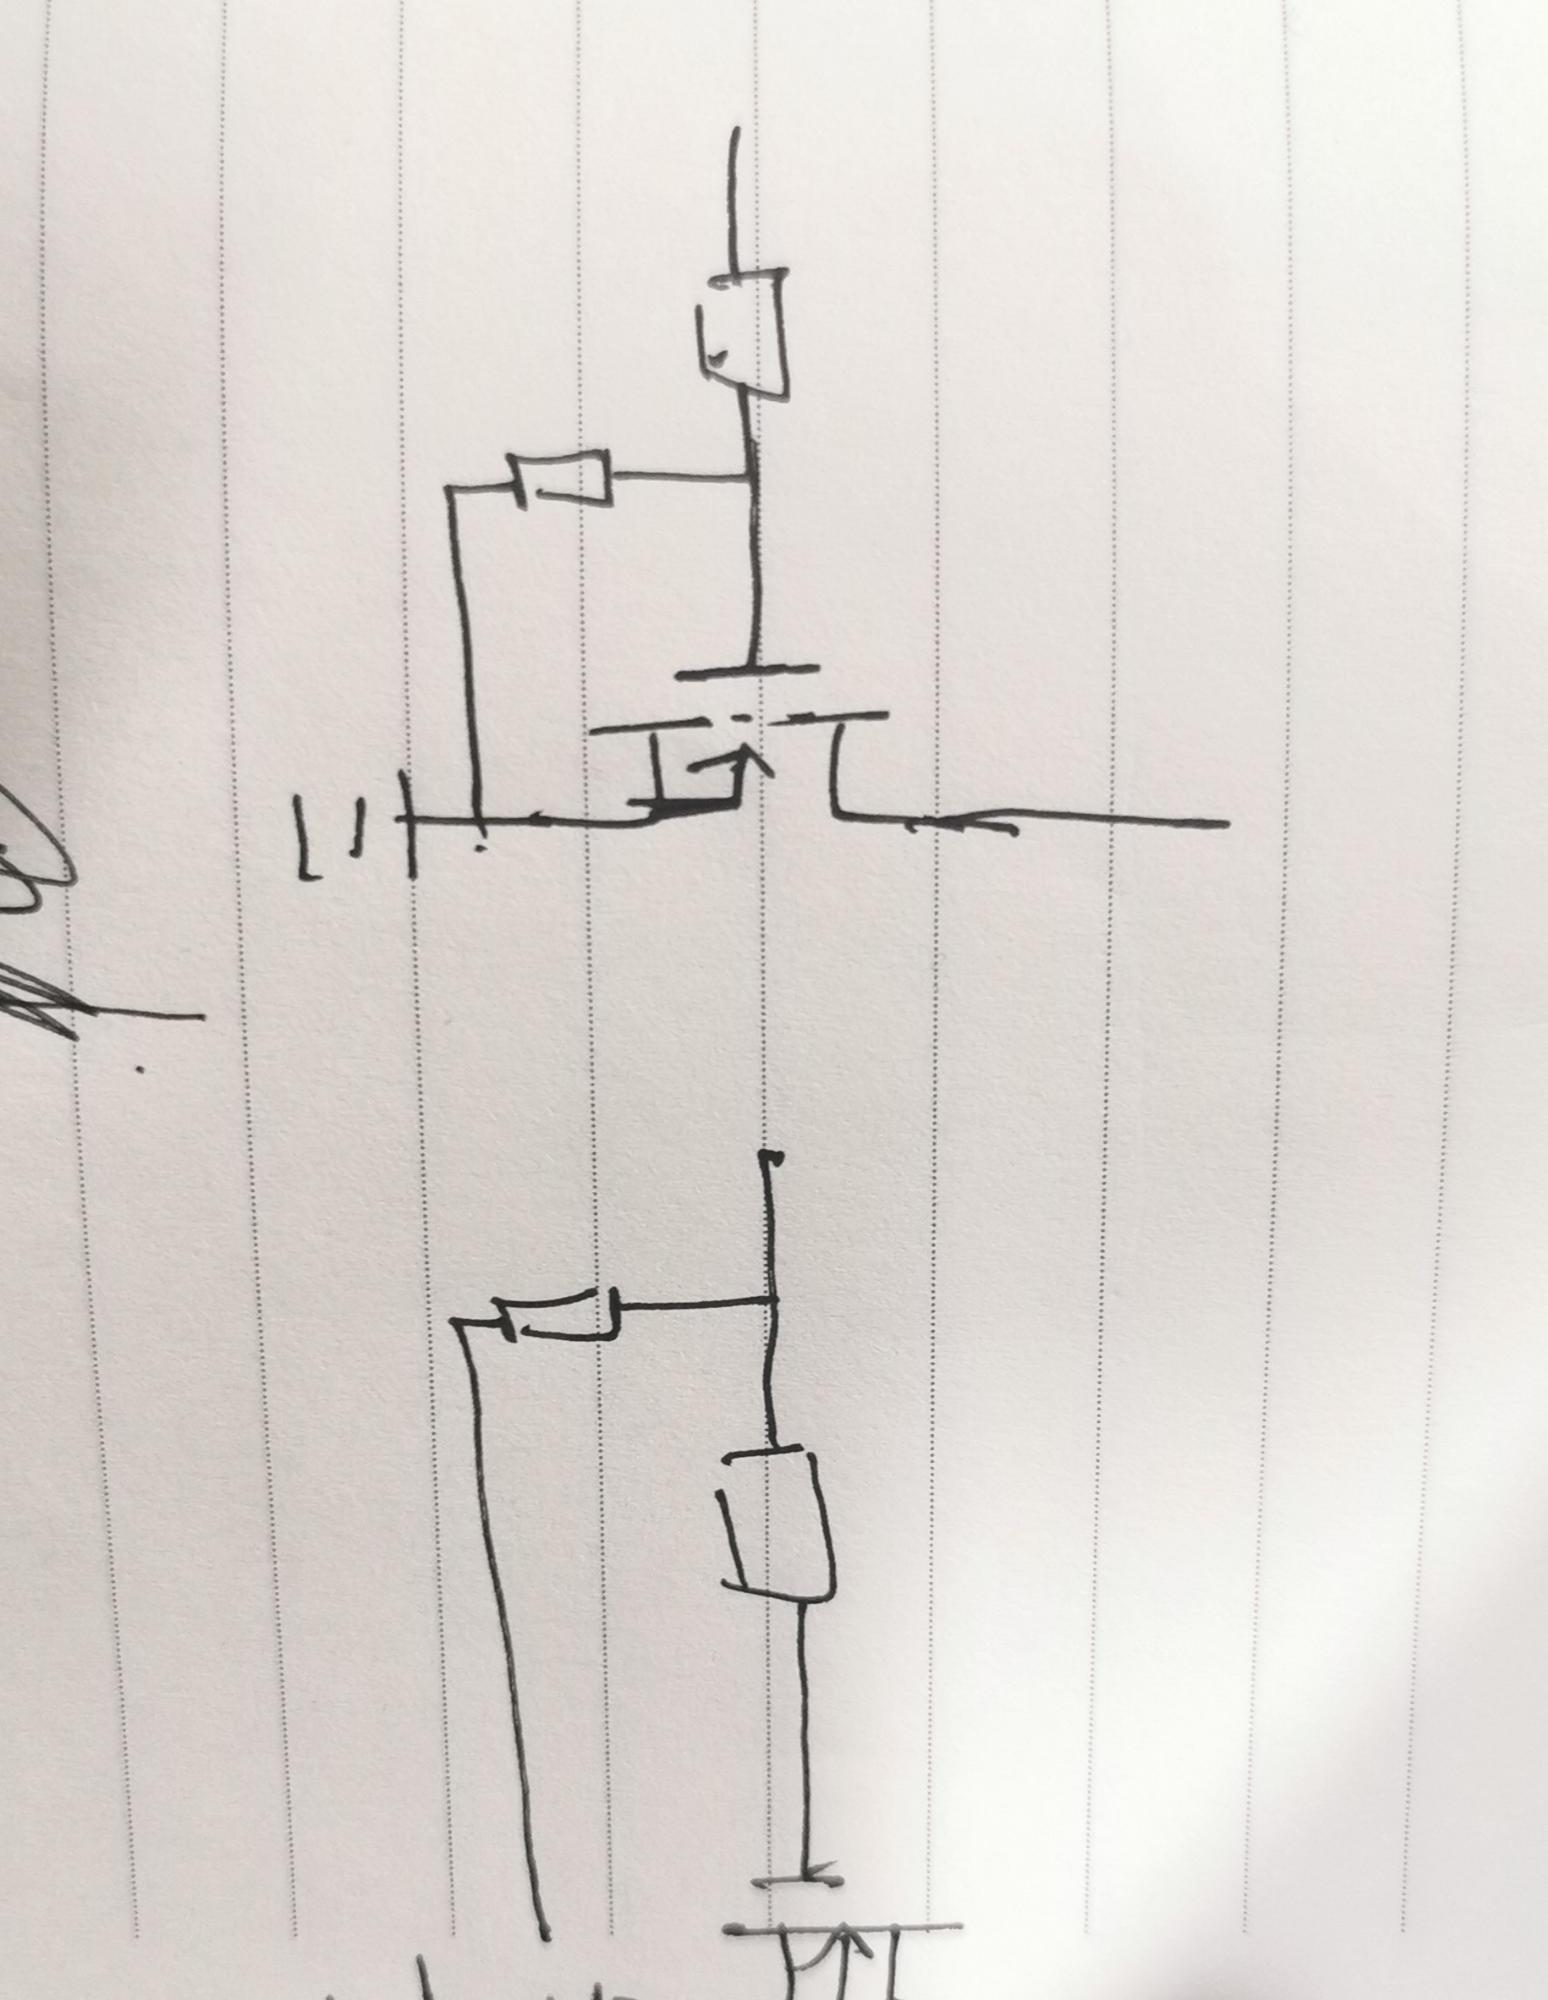 MOS的开关电路,下拉电阻的位置在哪比较合适